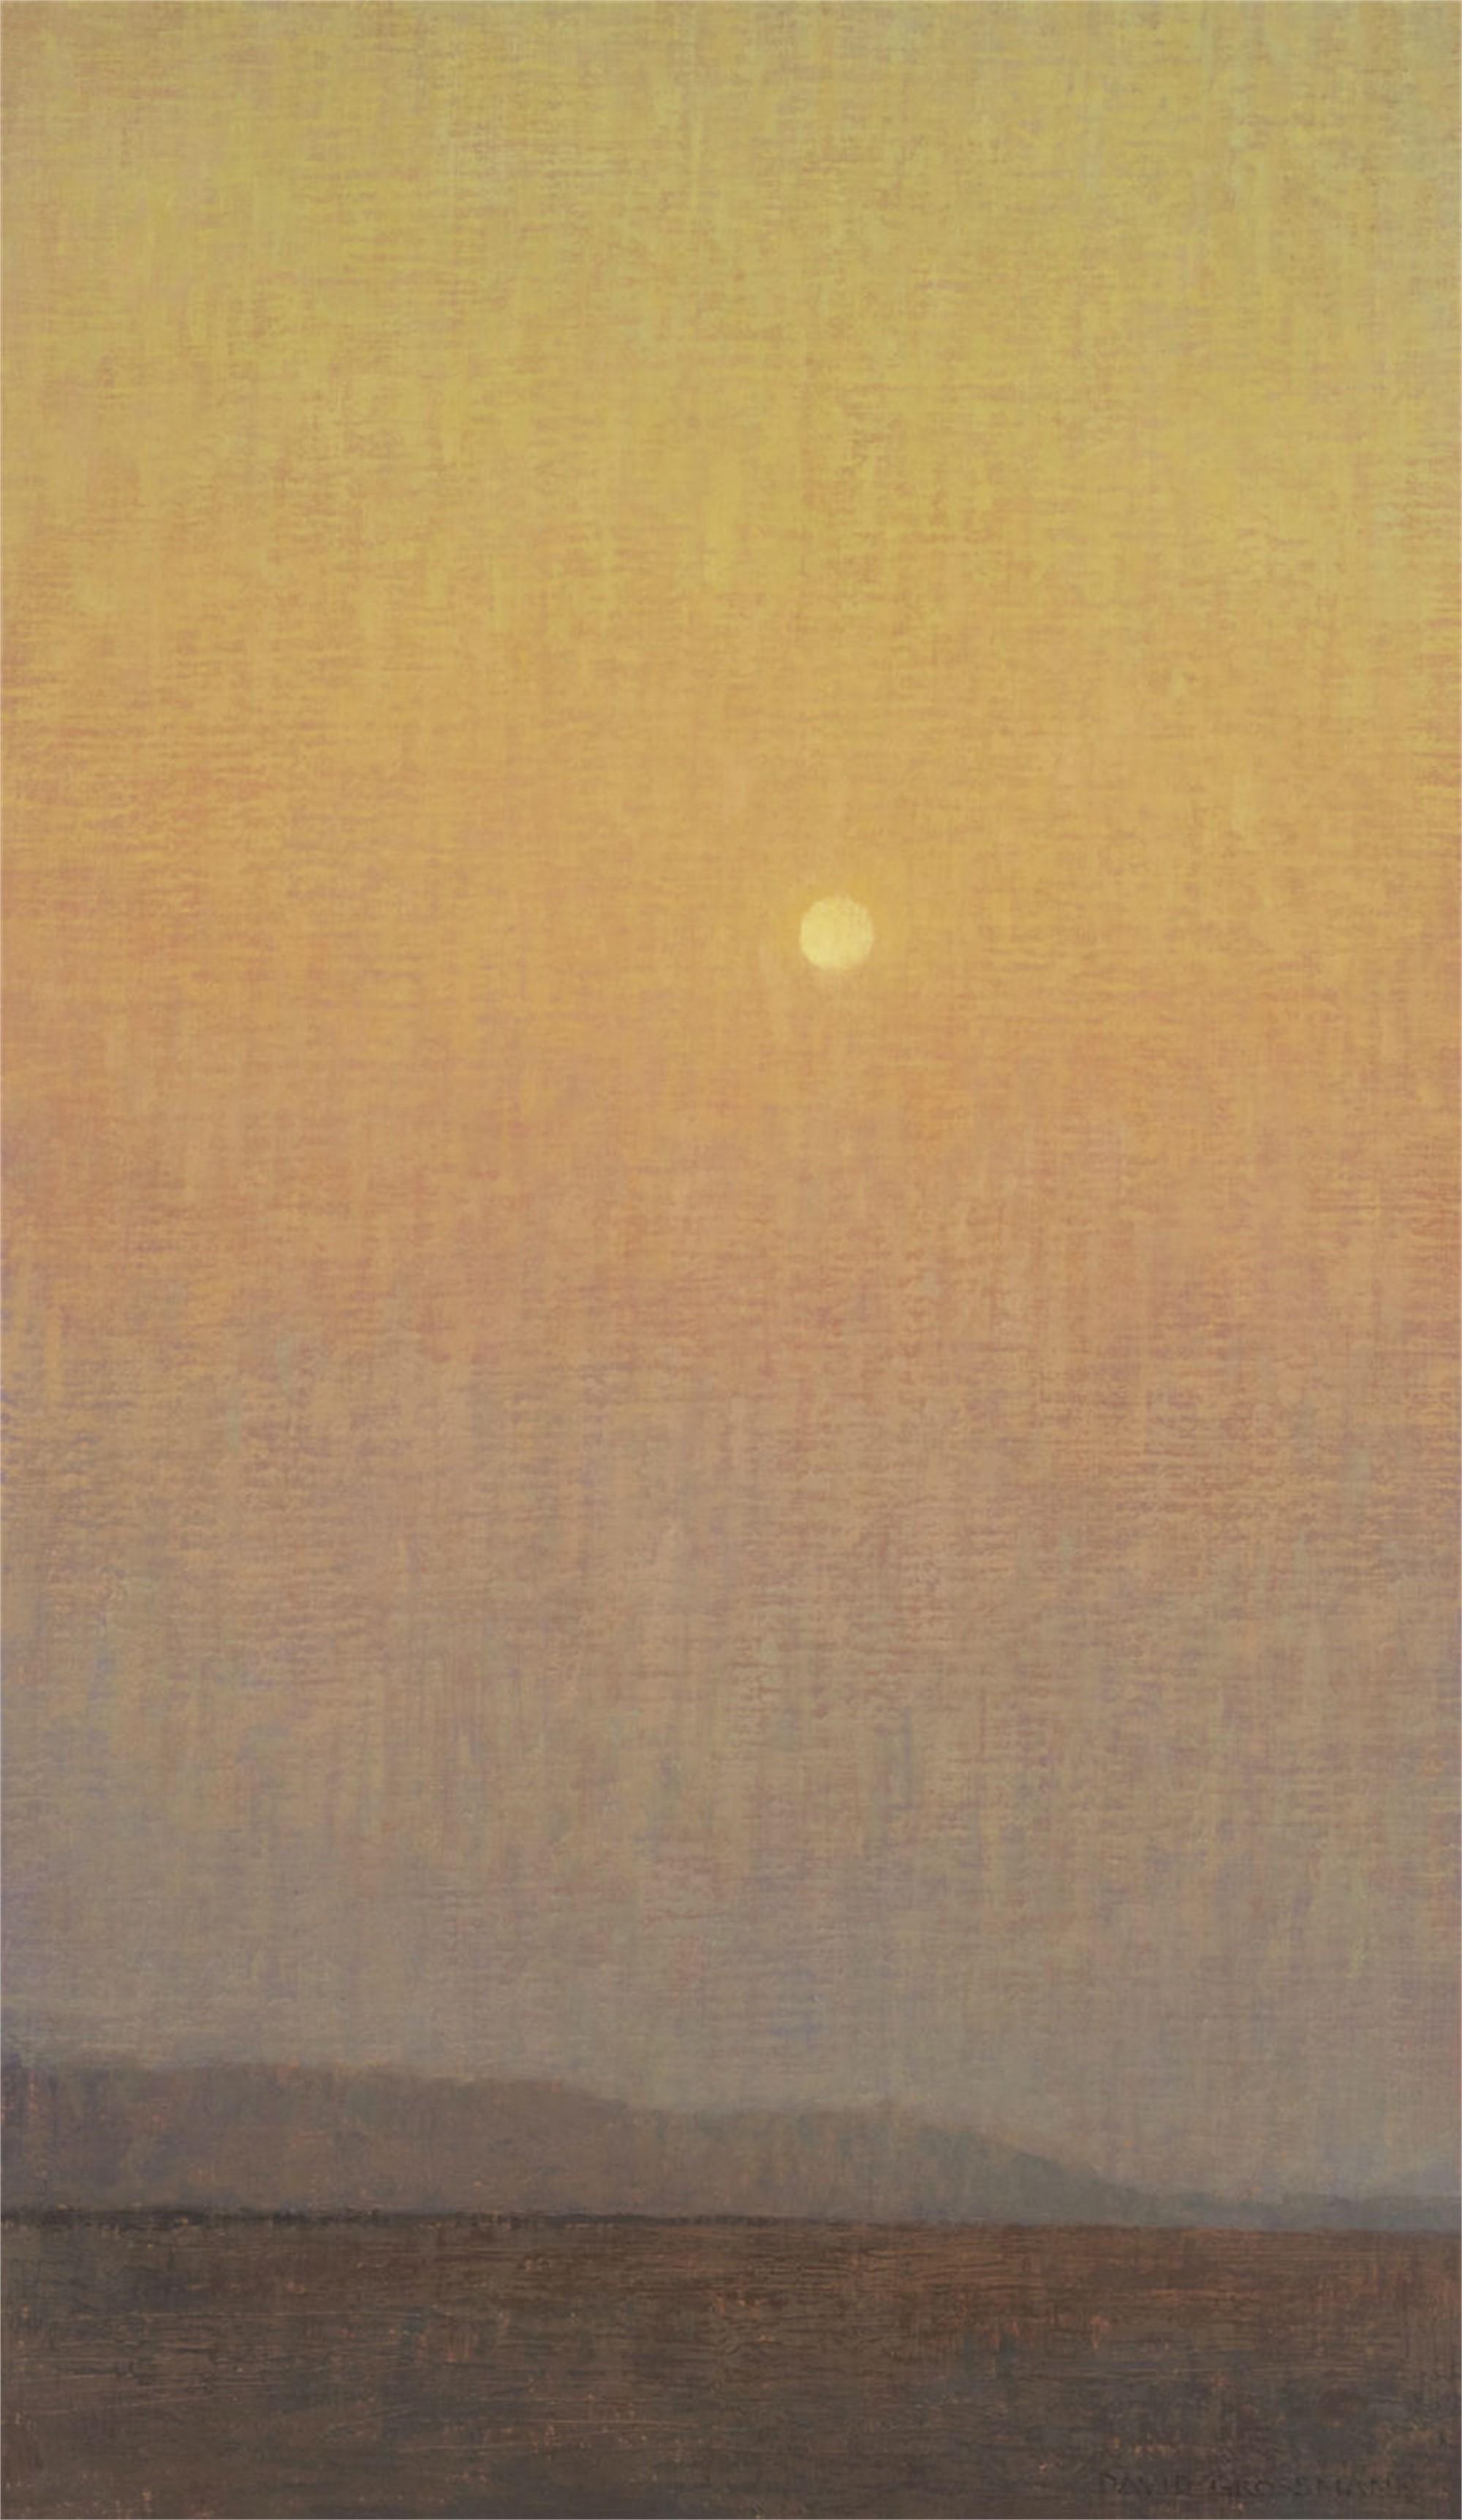 Vertical Morning Sky by David Grossmann